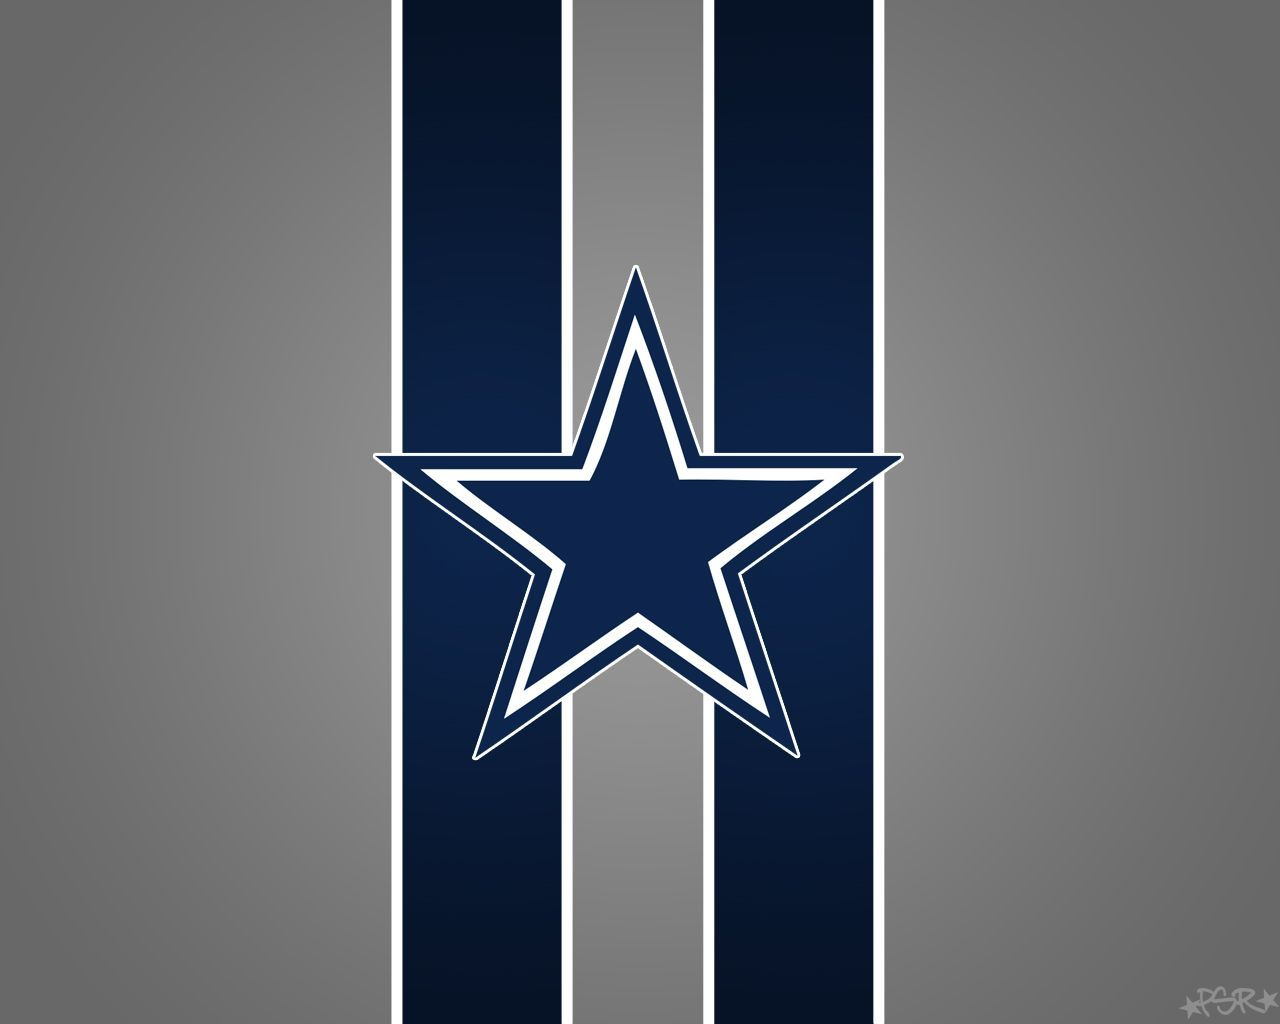 Dallas Cowboys Backgrounds For Desktop Wallpaper Dallas Cowboys Wallpaper Dallas Cowboys Background Dallas Cowboys